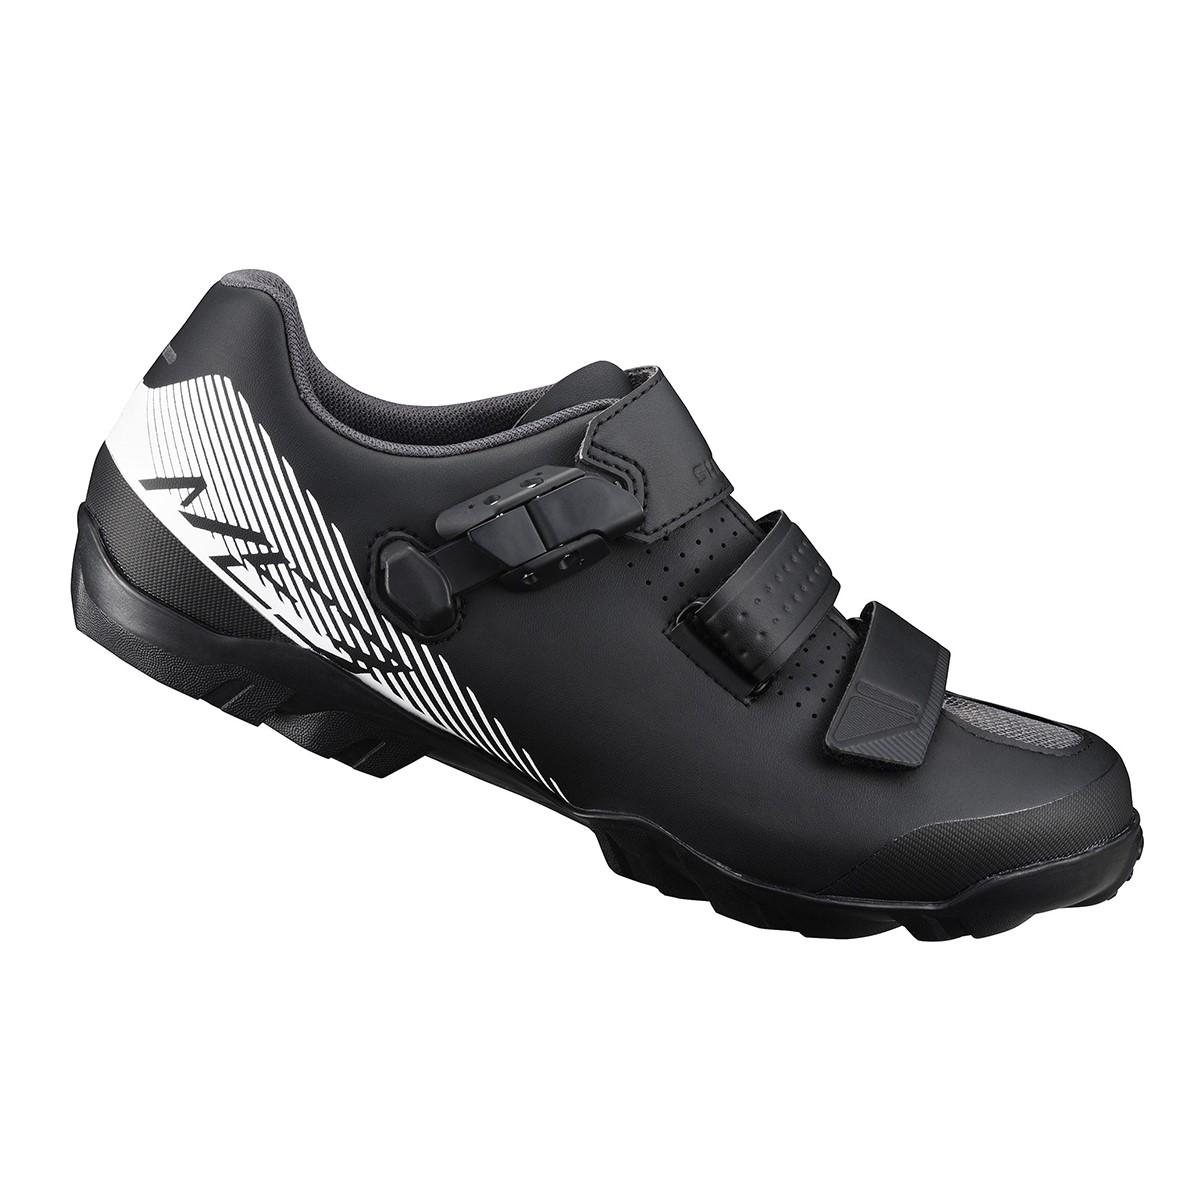 Shimano (ME3) MTB Shoe